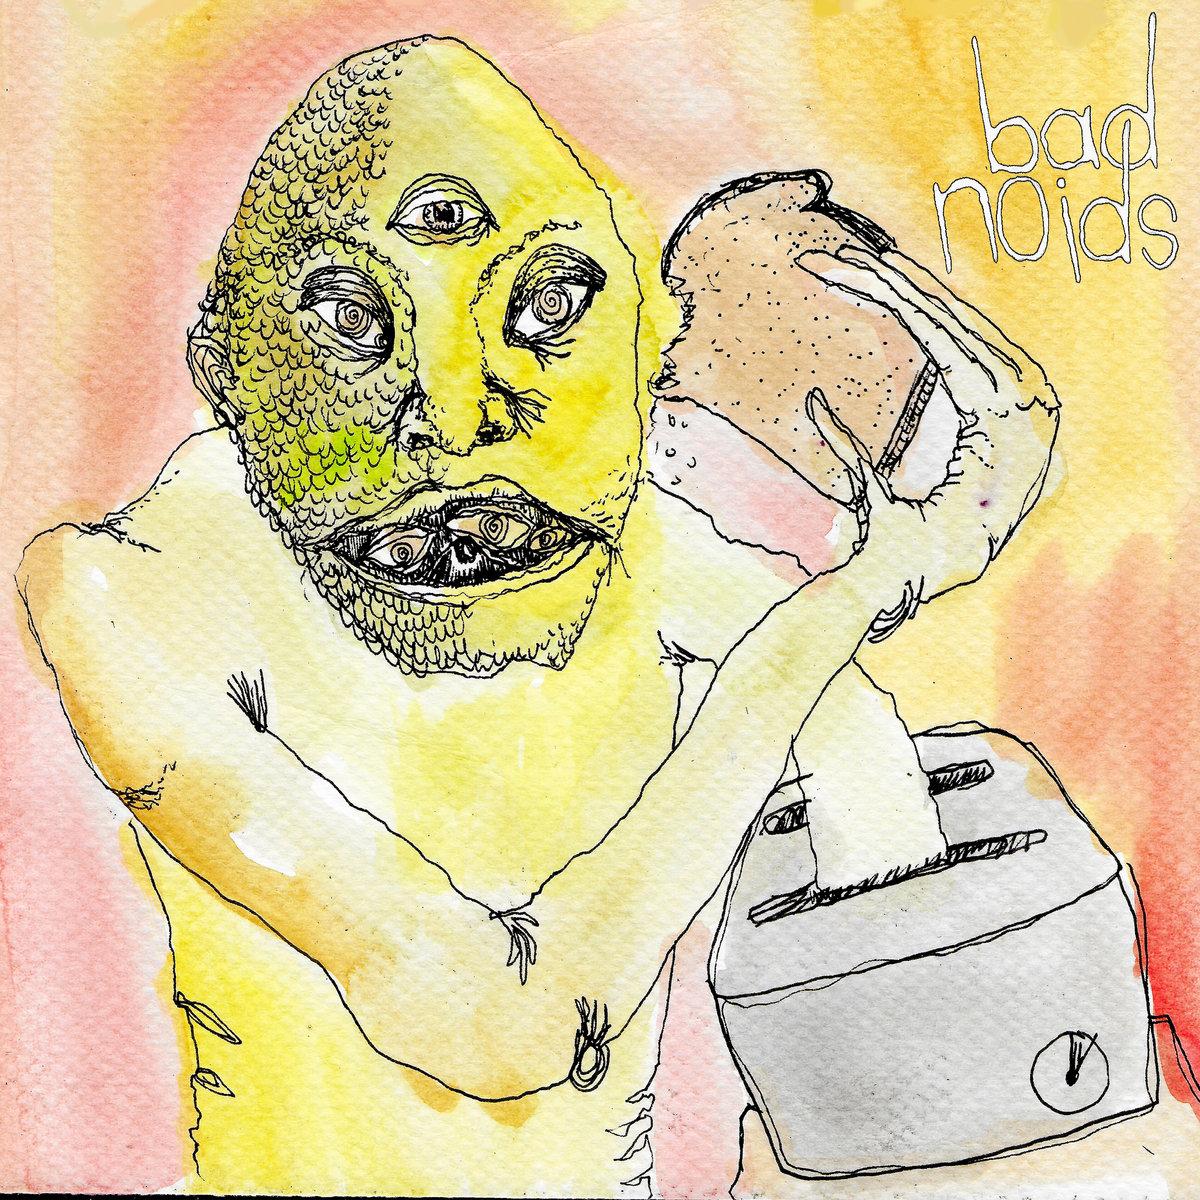 BAD NOIDS